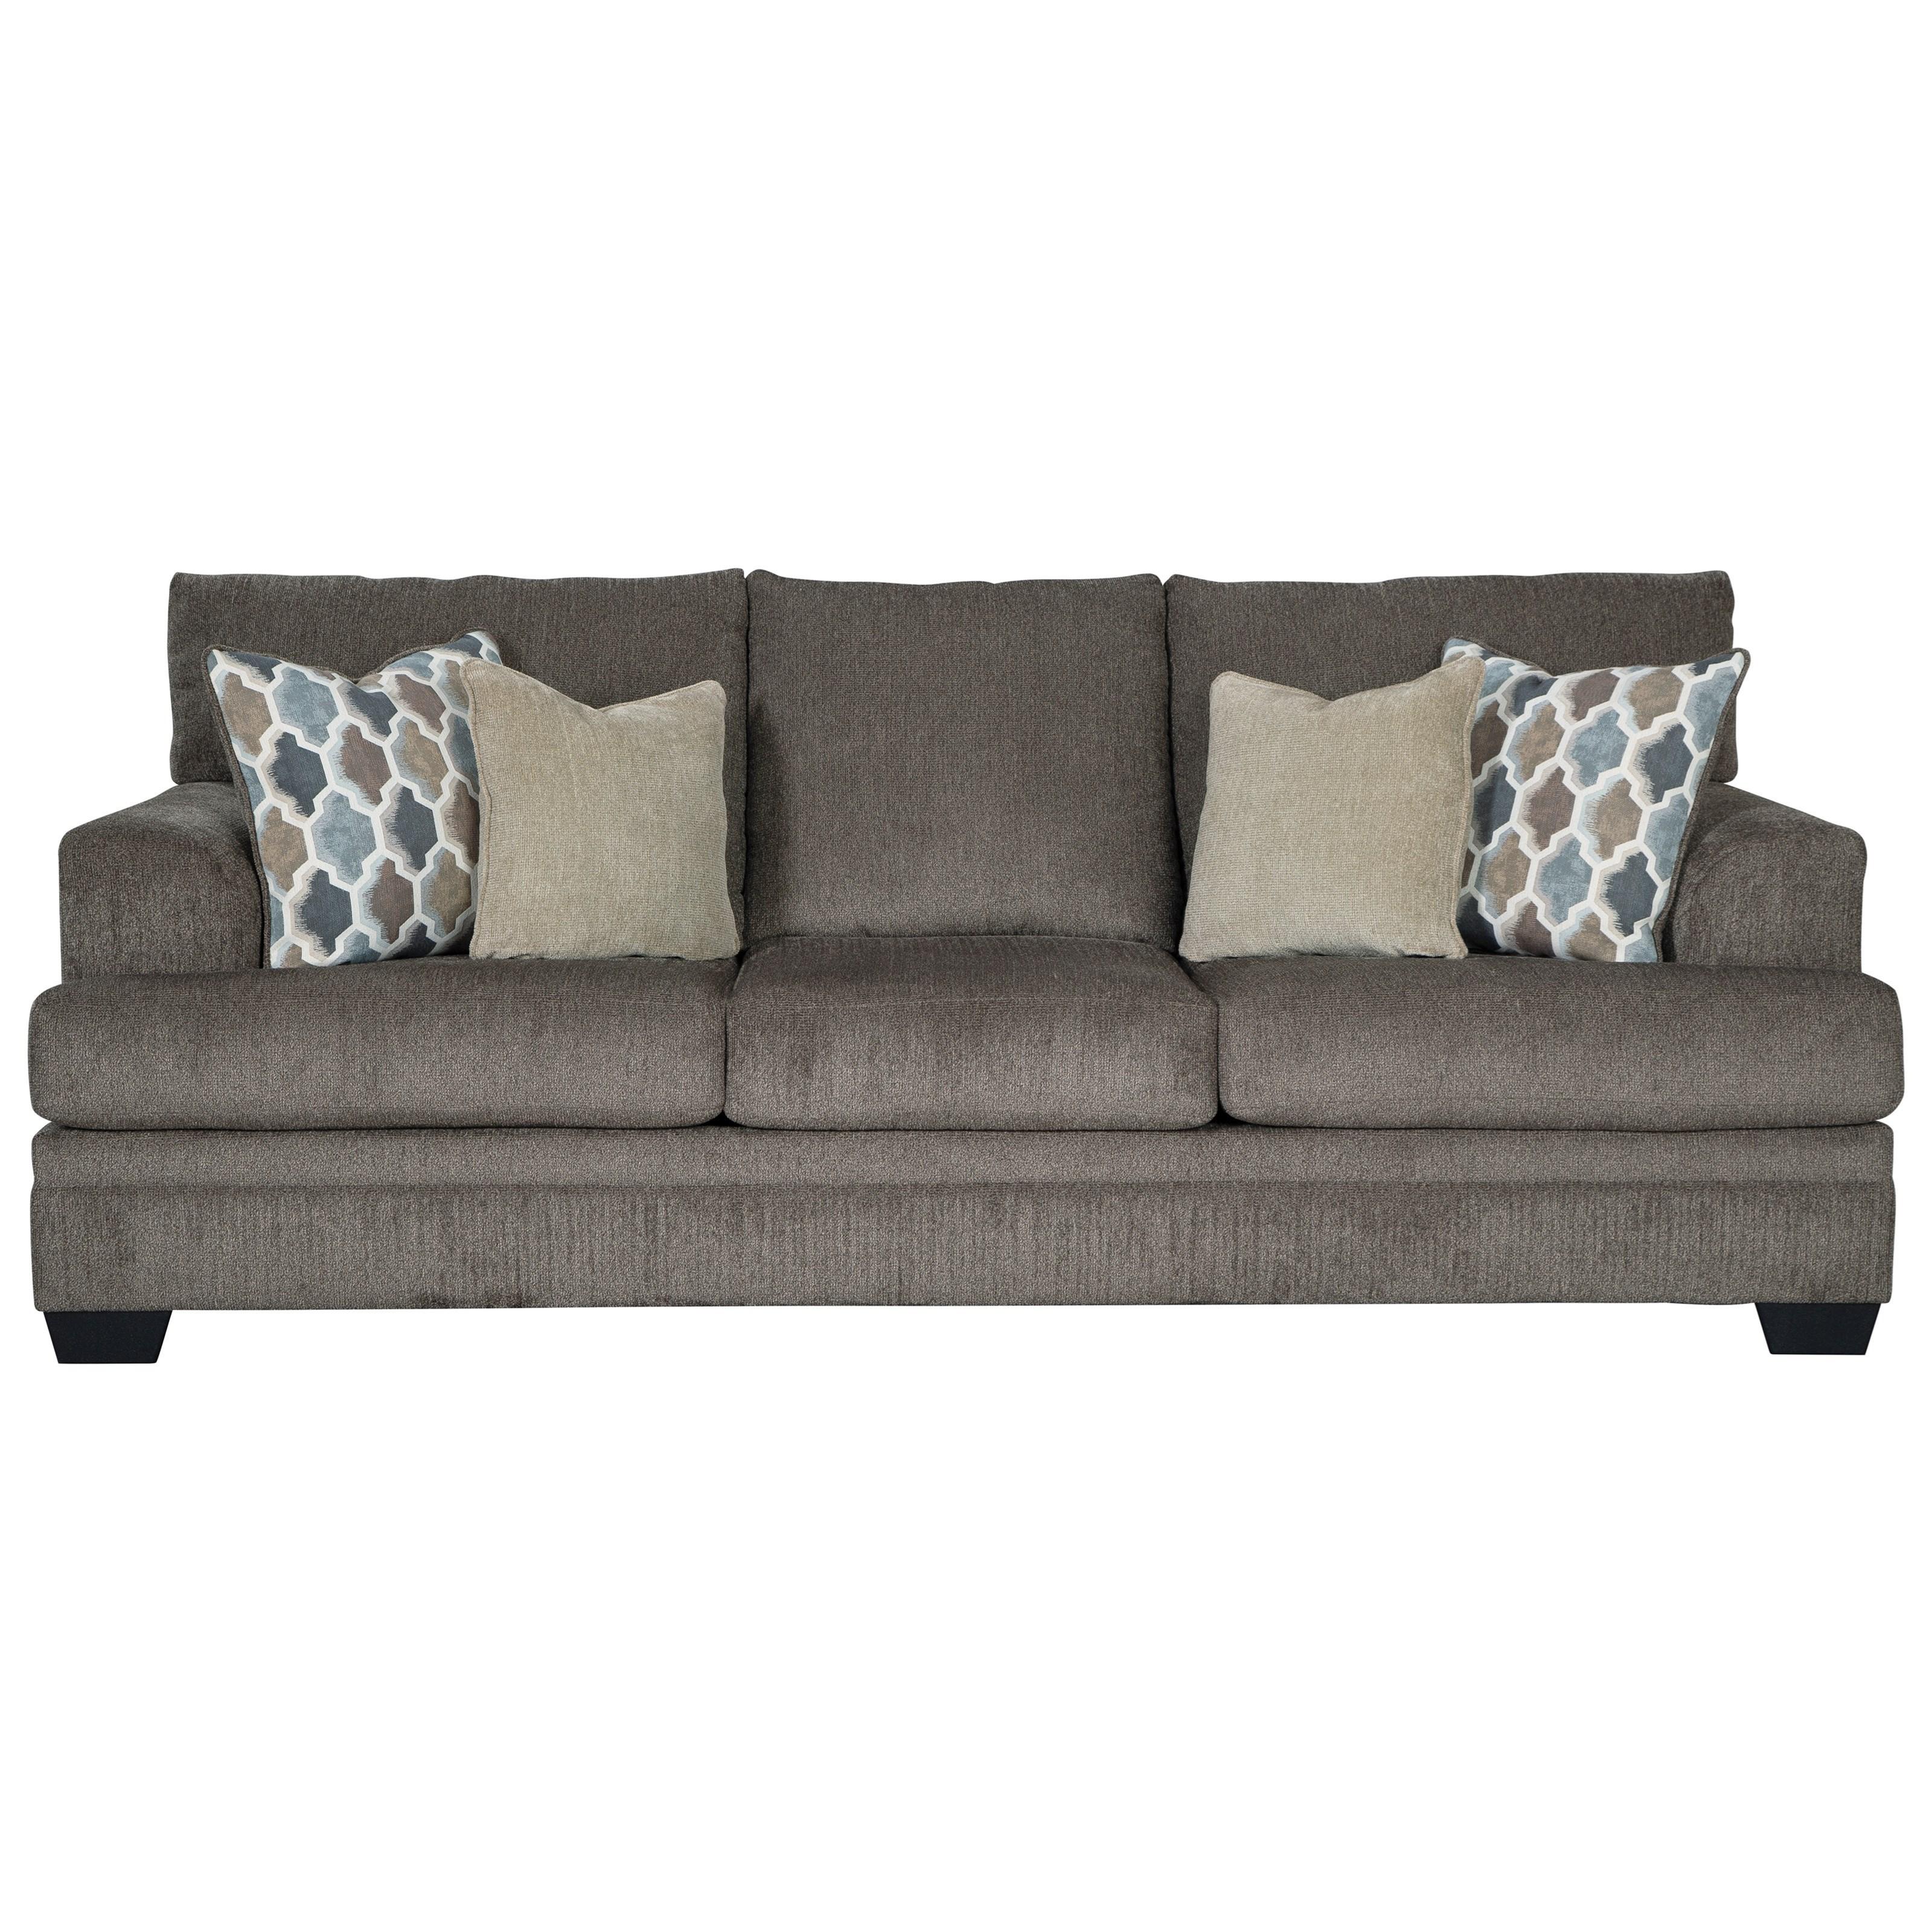 Dorsten Queen Sofa Sleeper by Ashley (Signature Design) at Johnny Janosik